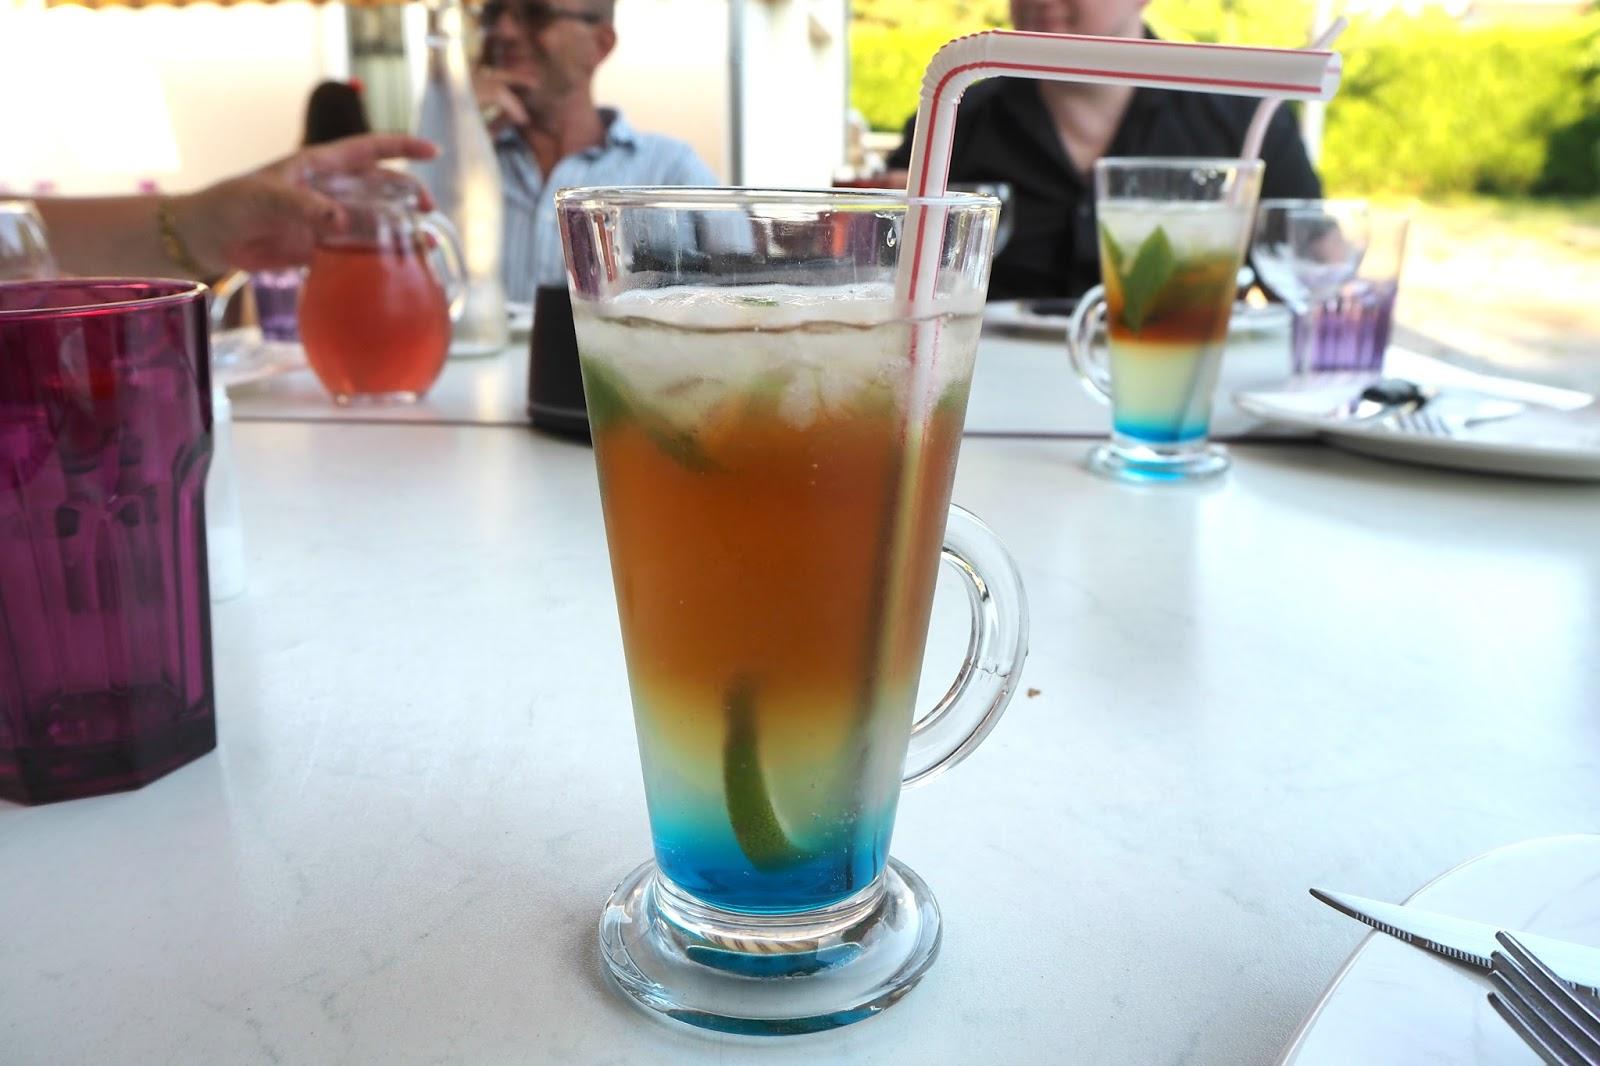 Funky drink